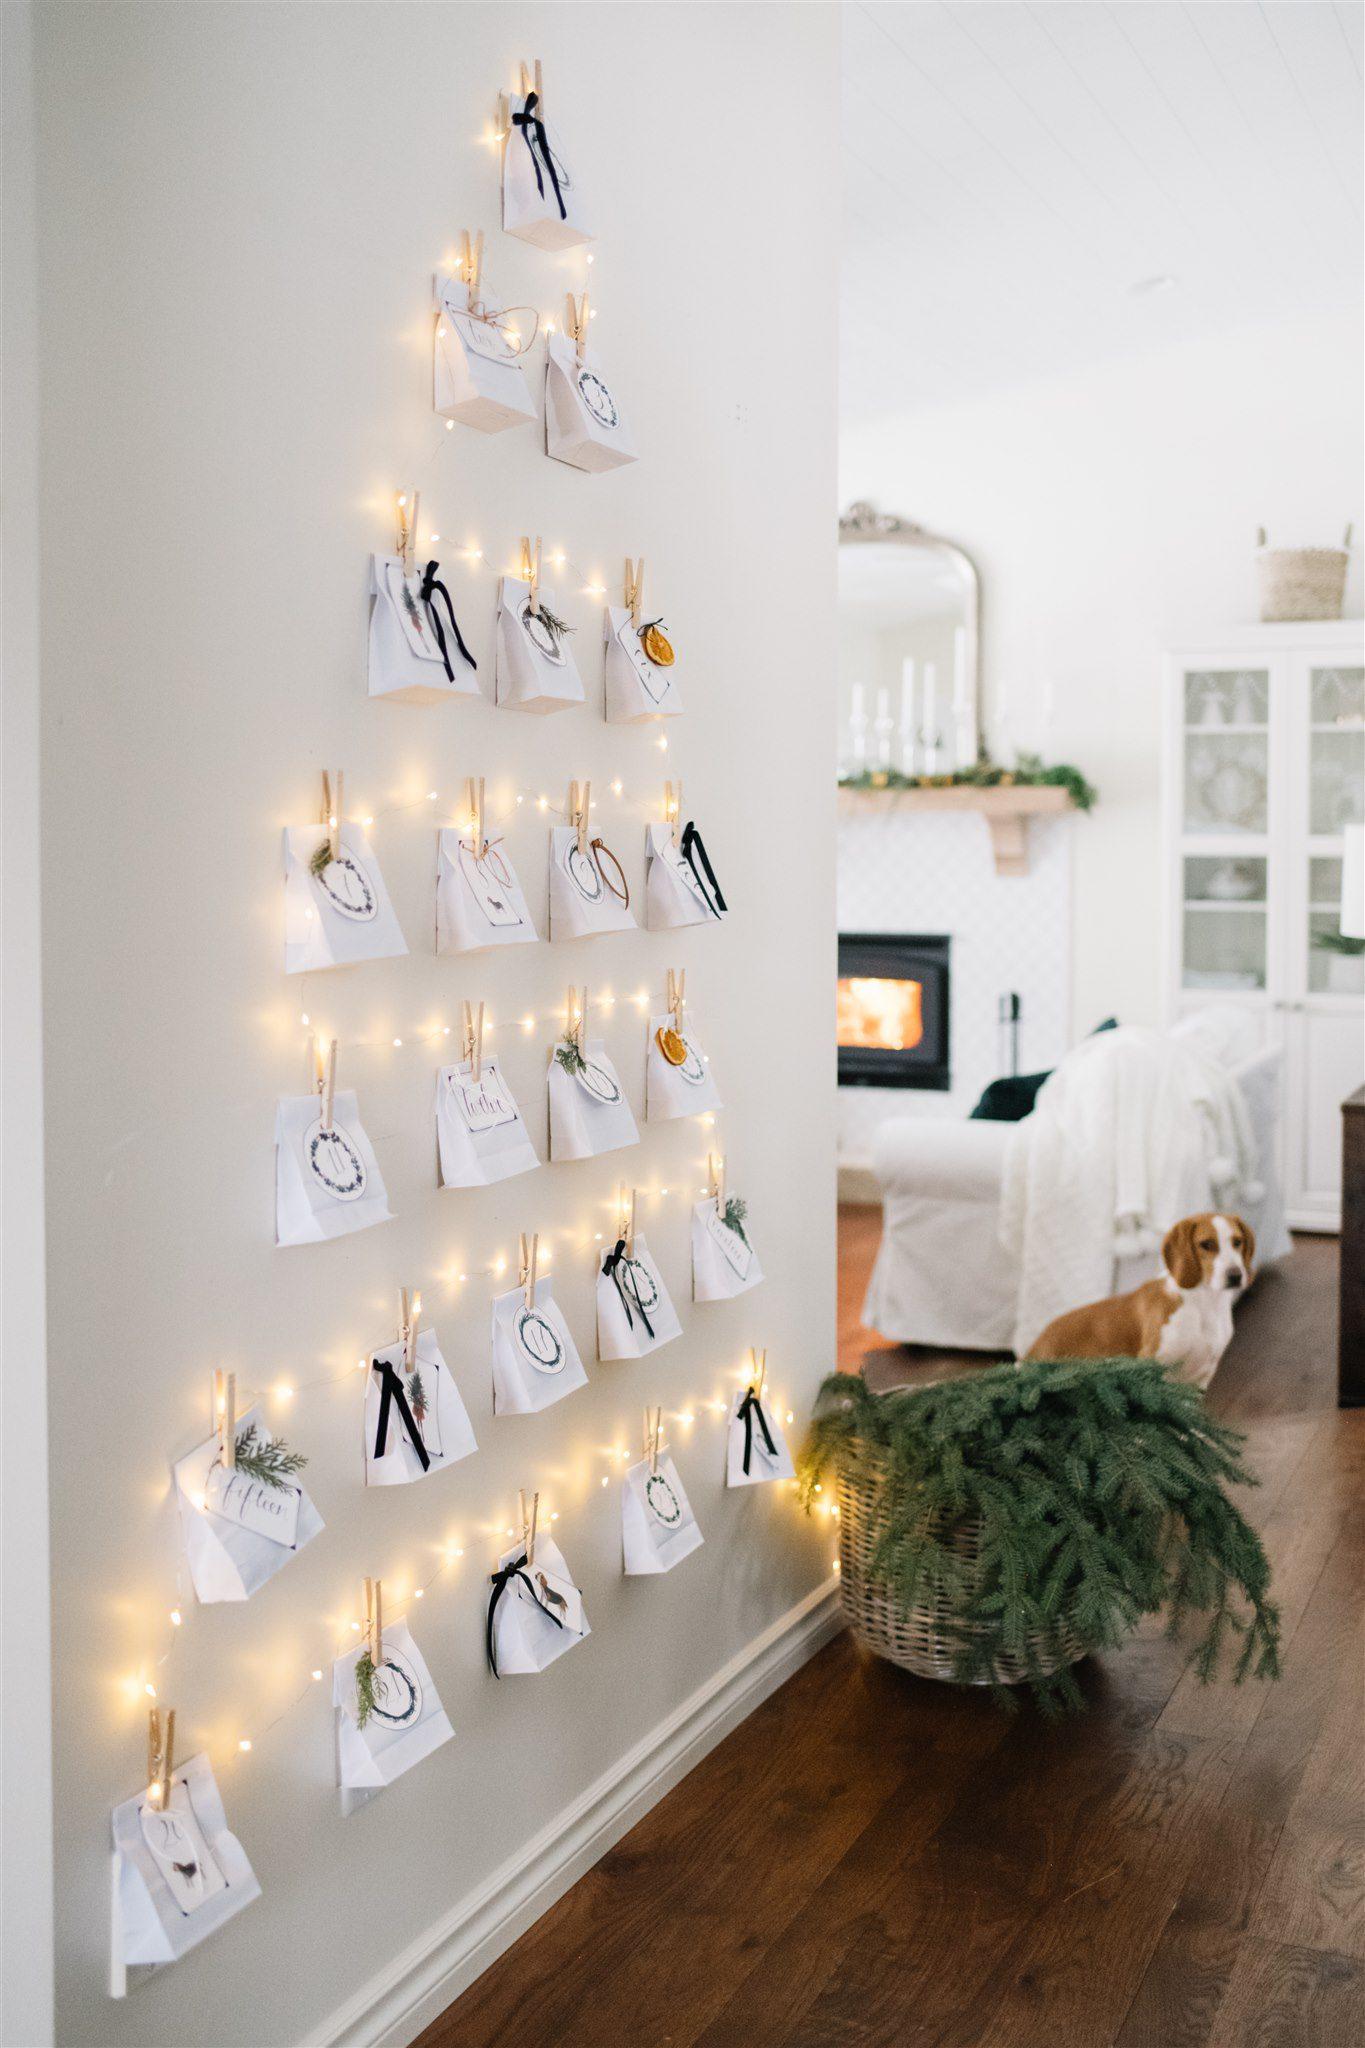 DIY adventskalender van Thegingerhome.com